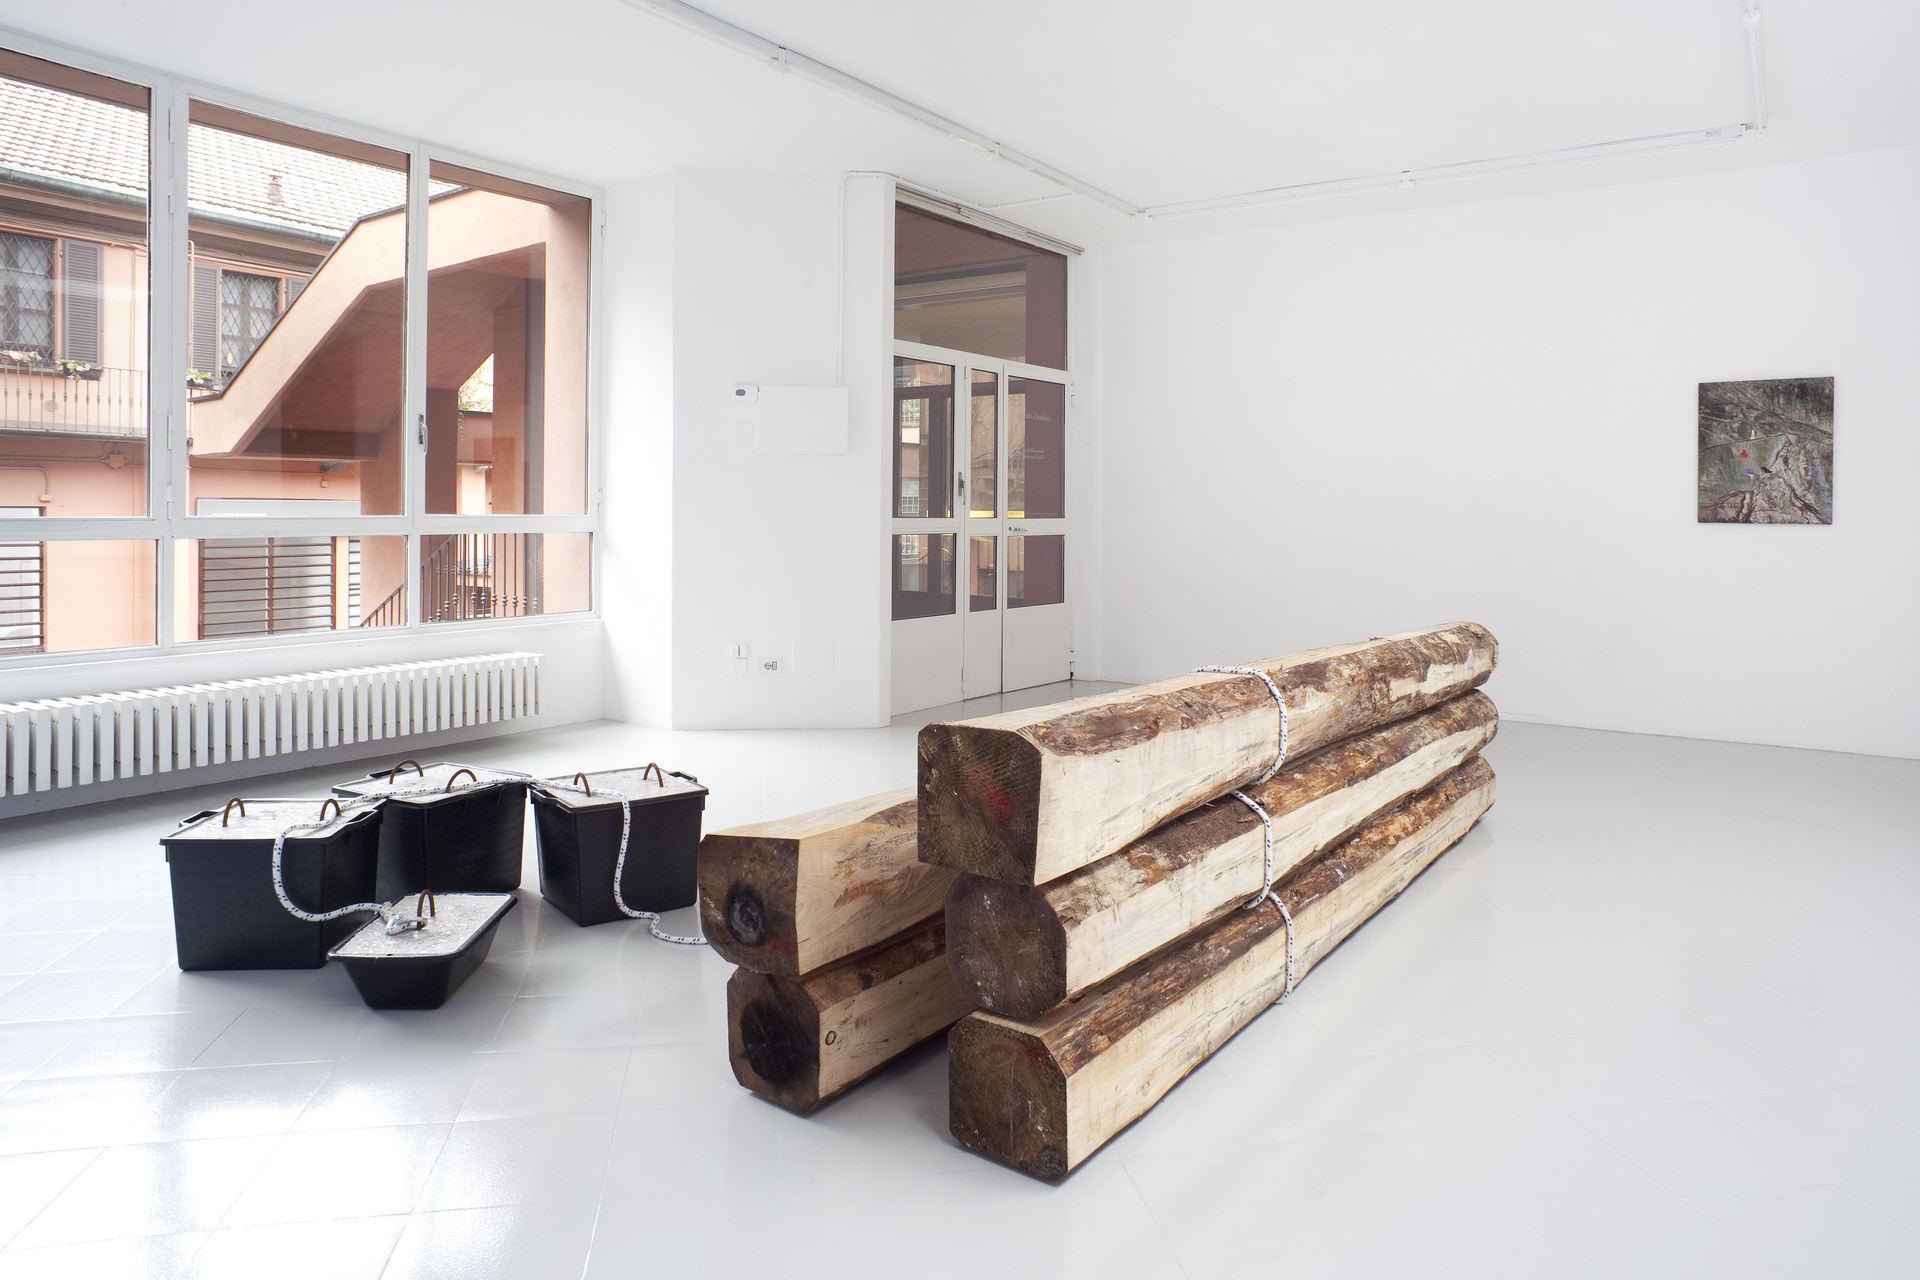 6 - Karsten Fo¦êdinger, Pieter Vermeersch, Installation View, 2015, Cabinet, Milano - Courtesy Artists and Cabinet, Milan, Photo Filippo Armellin copia